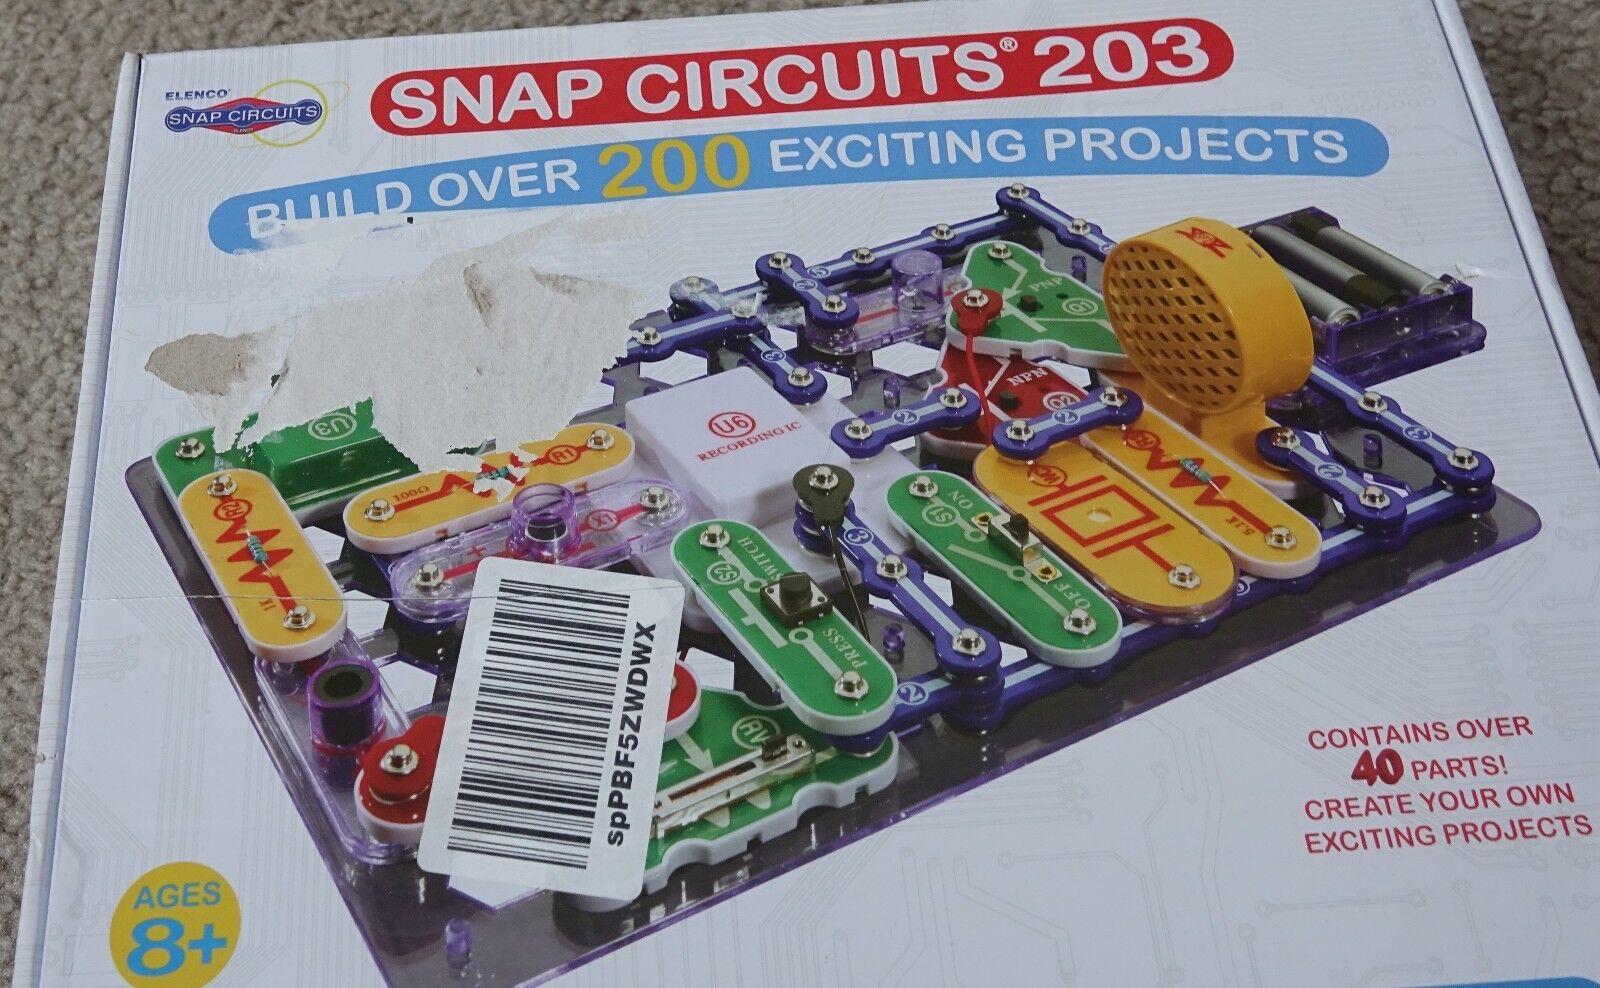 Electronic Snap Circuits 203 Manual Guide Wiring Diagram Jr Electronics Exploration Kit Over 200 Stem Rh Akkofastener Com